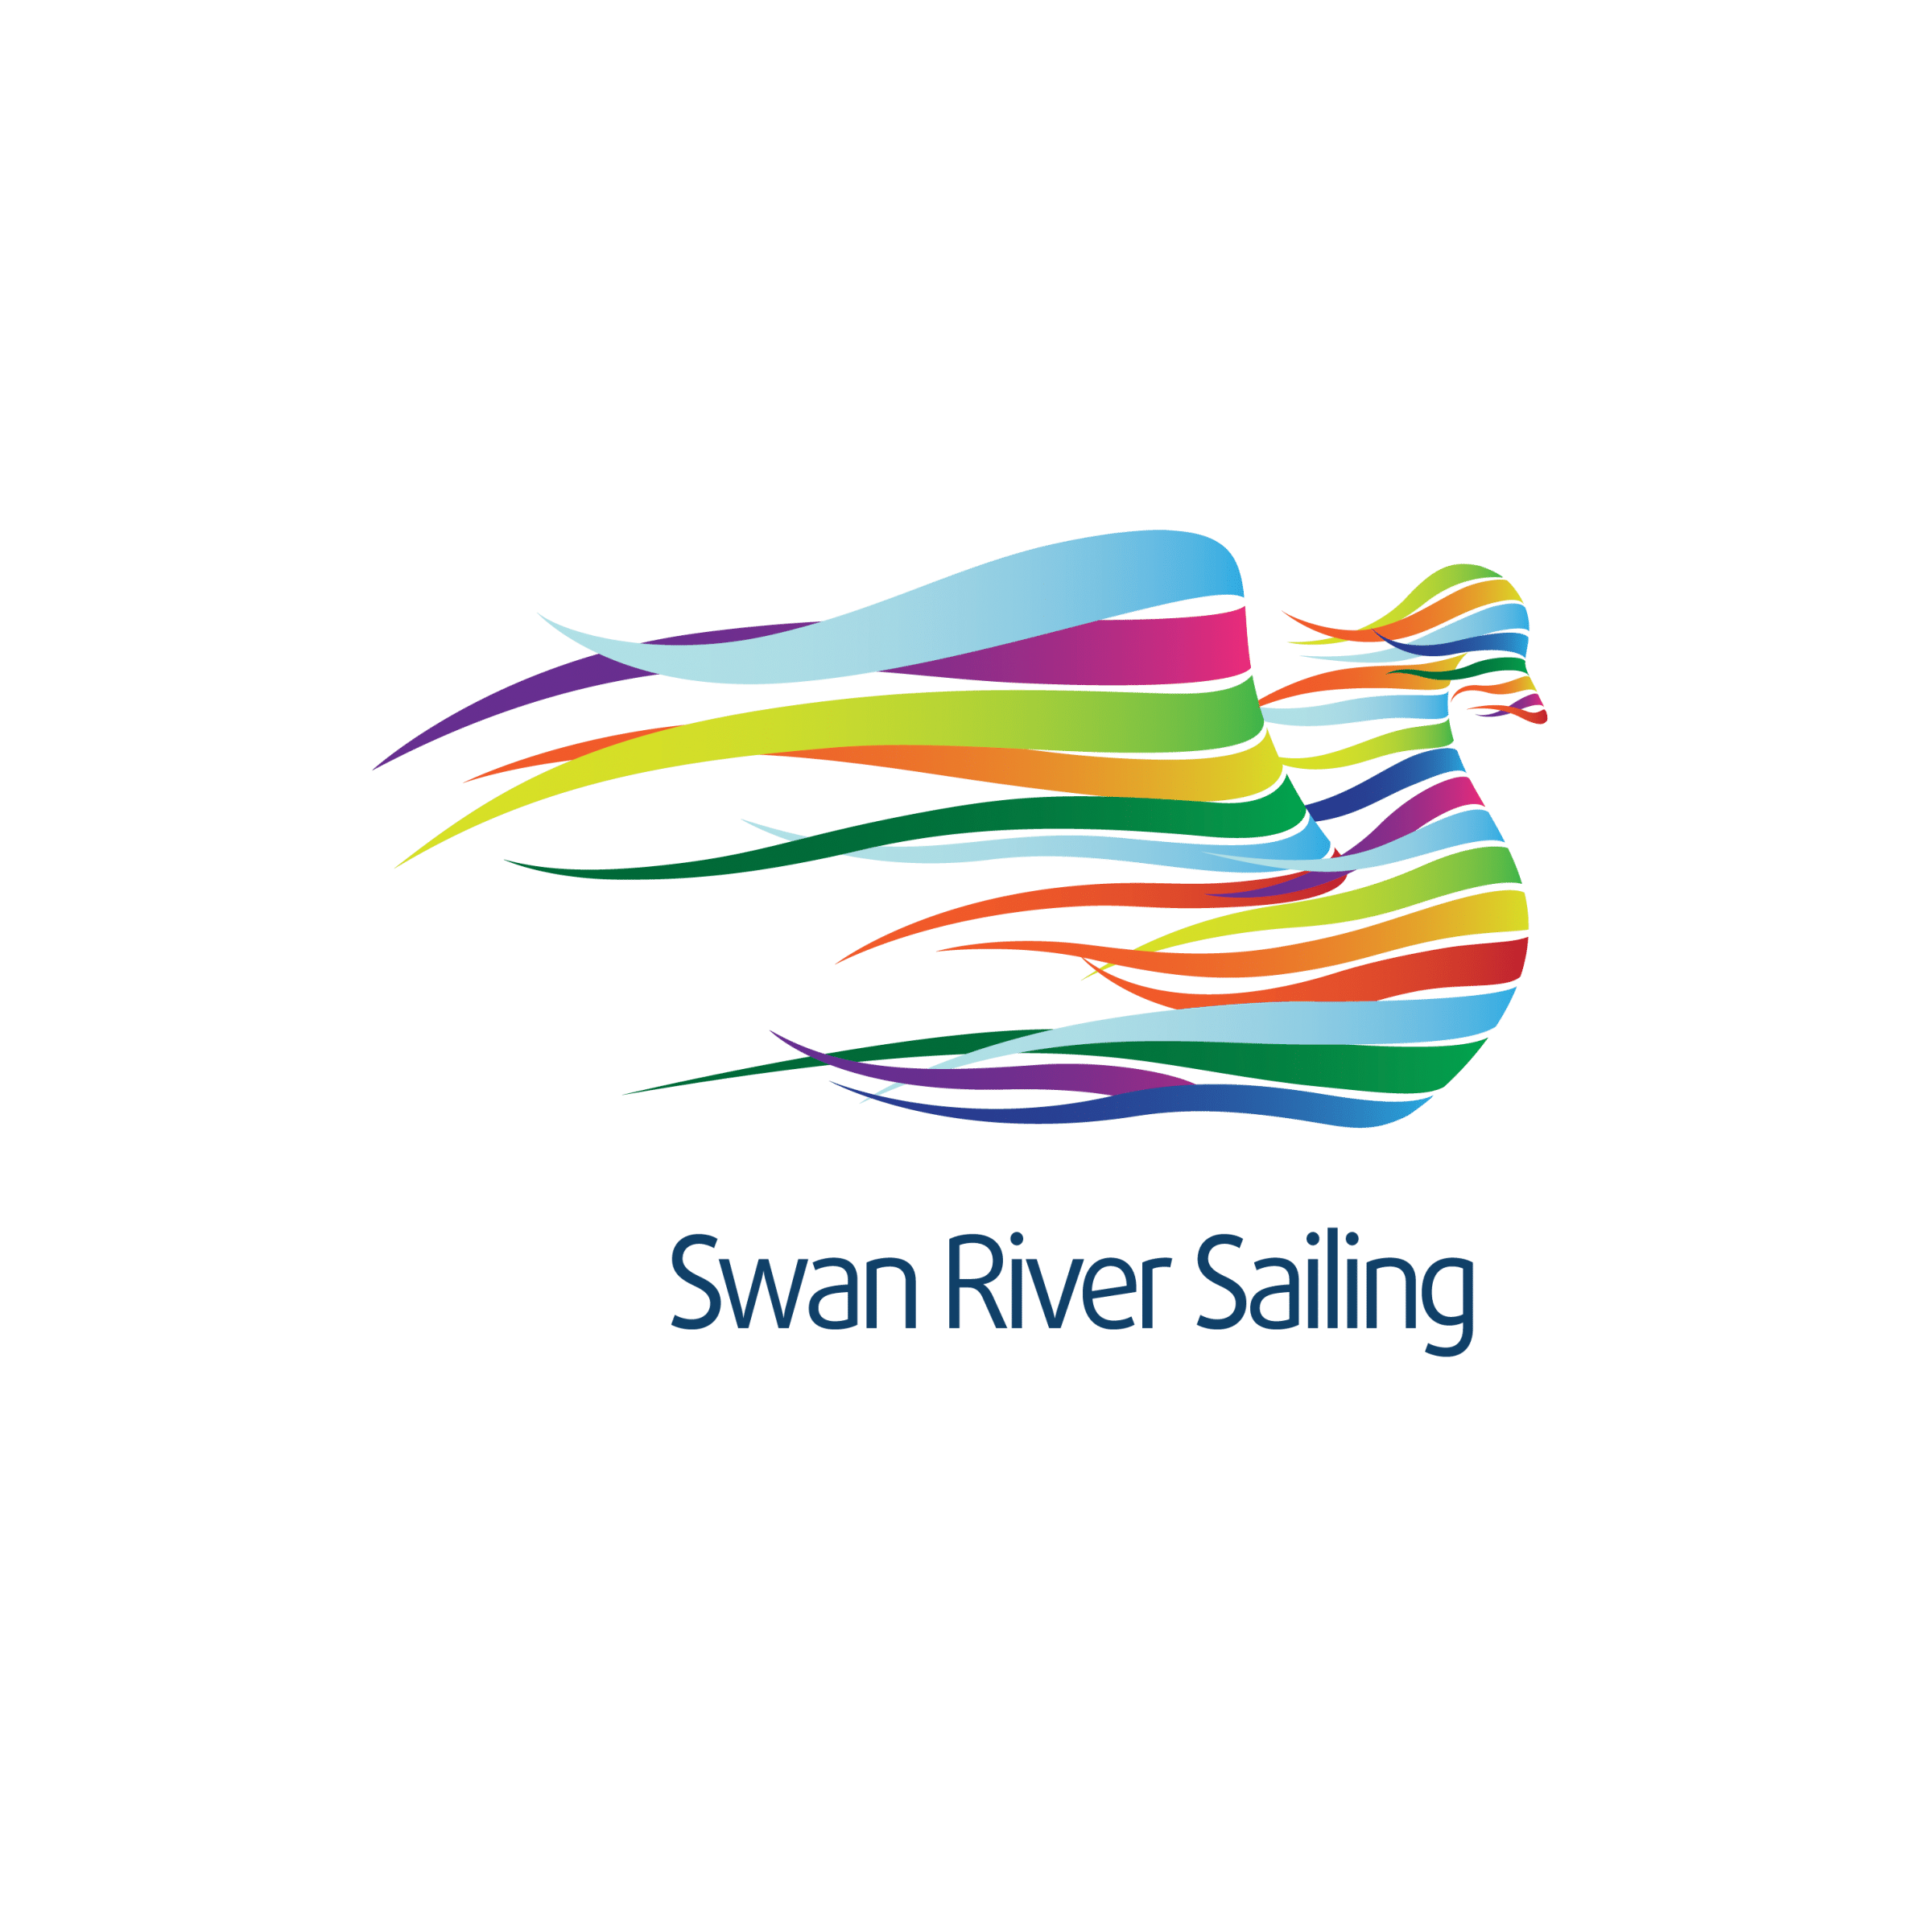 swan river sailing logo